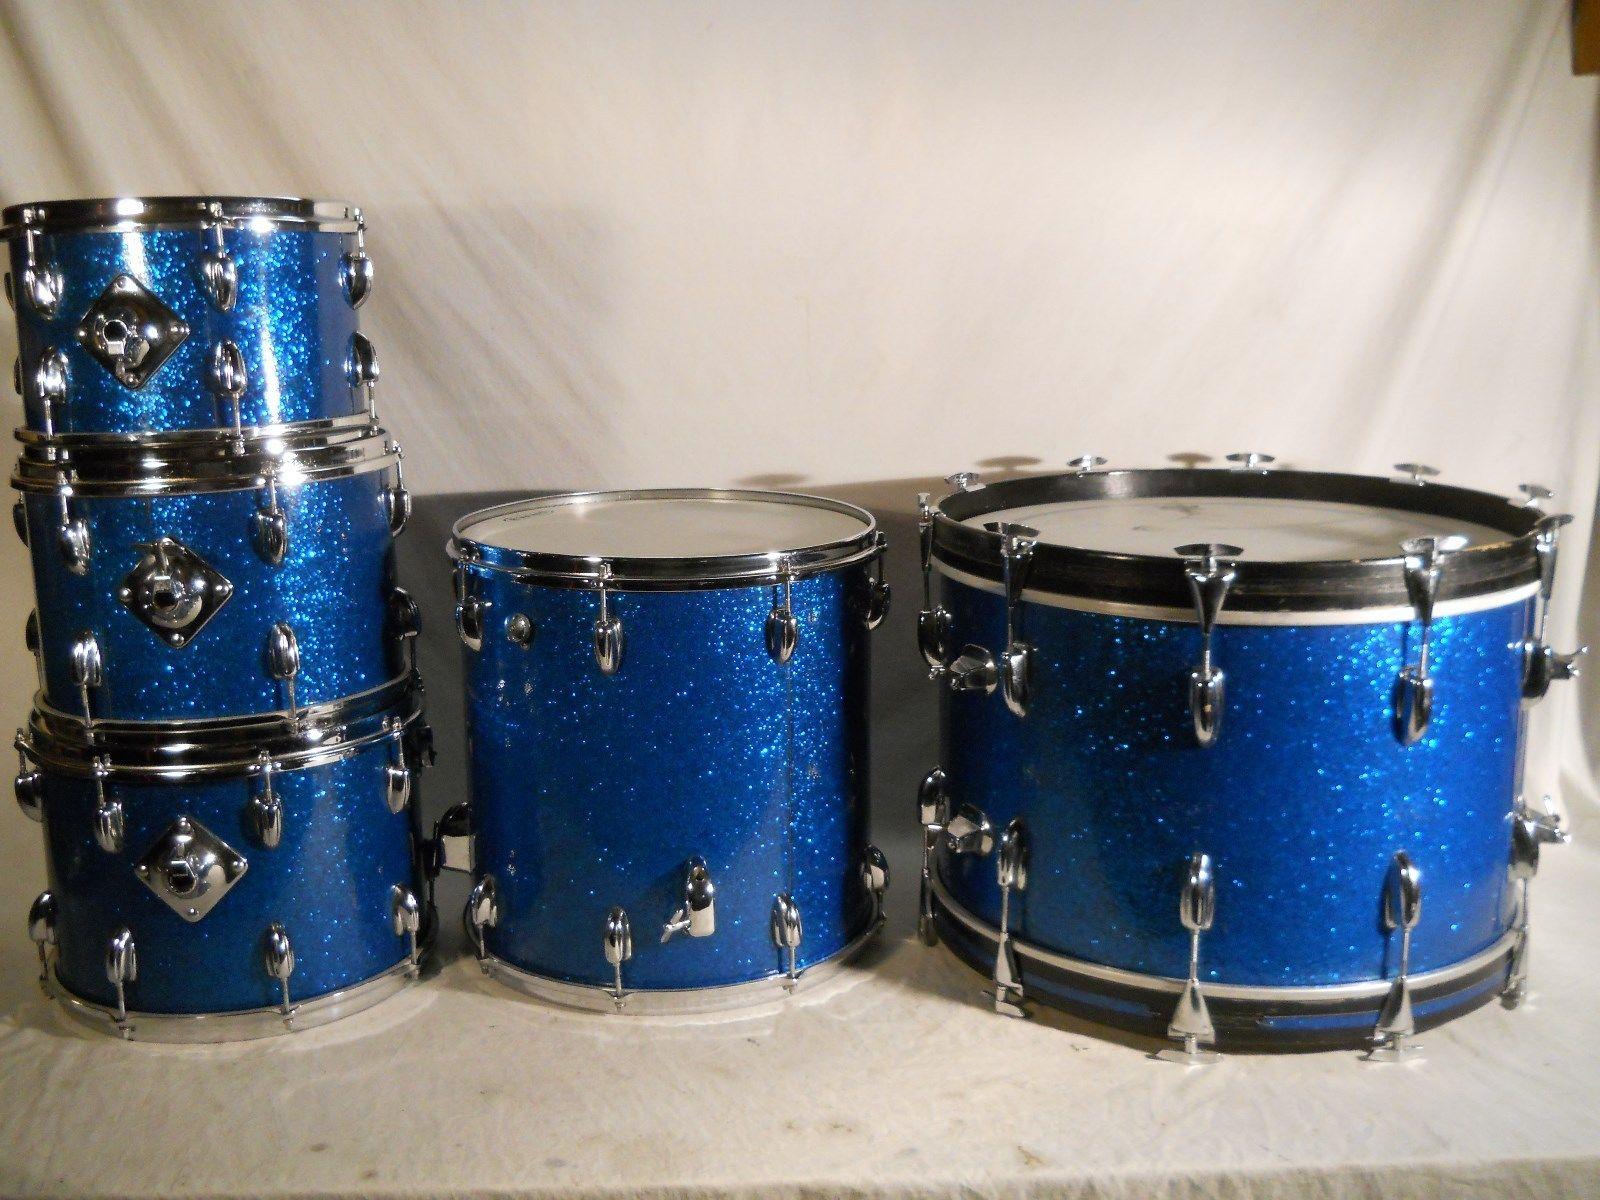 Slingerland Drums For Sale : slingerland usa vintage 1970 blue sparkle drum percussion for sale plektrum ~ Russianpoet.info Haus und Dekorationen